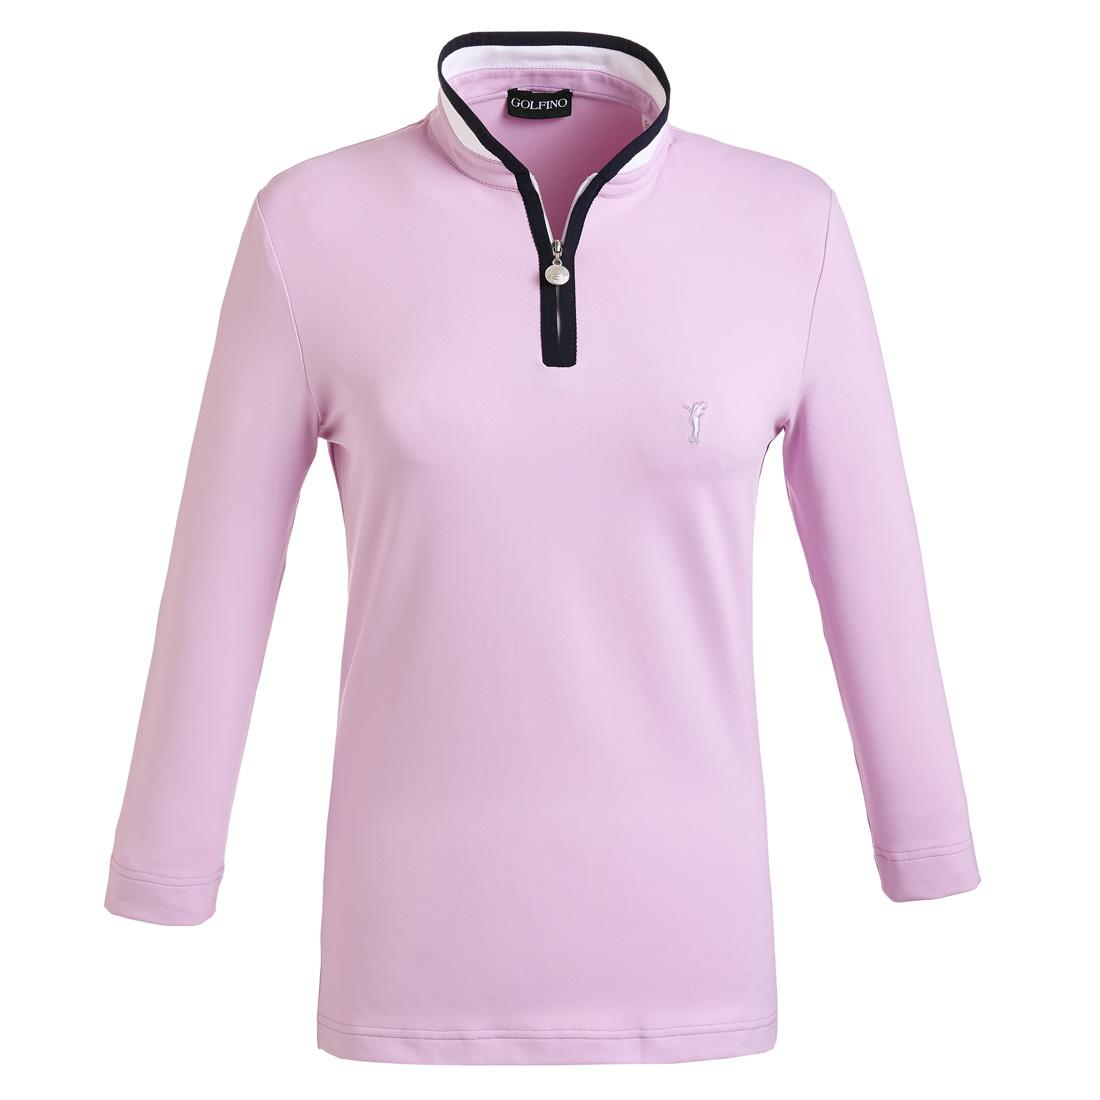 Damen 3/4-Arm Funktions-Golfpolo Slim Fit